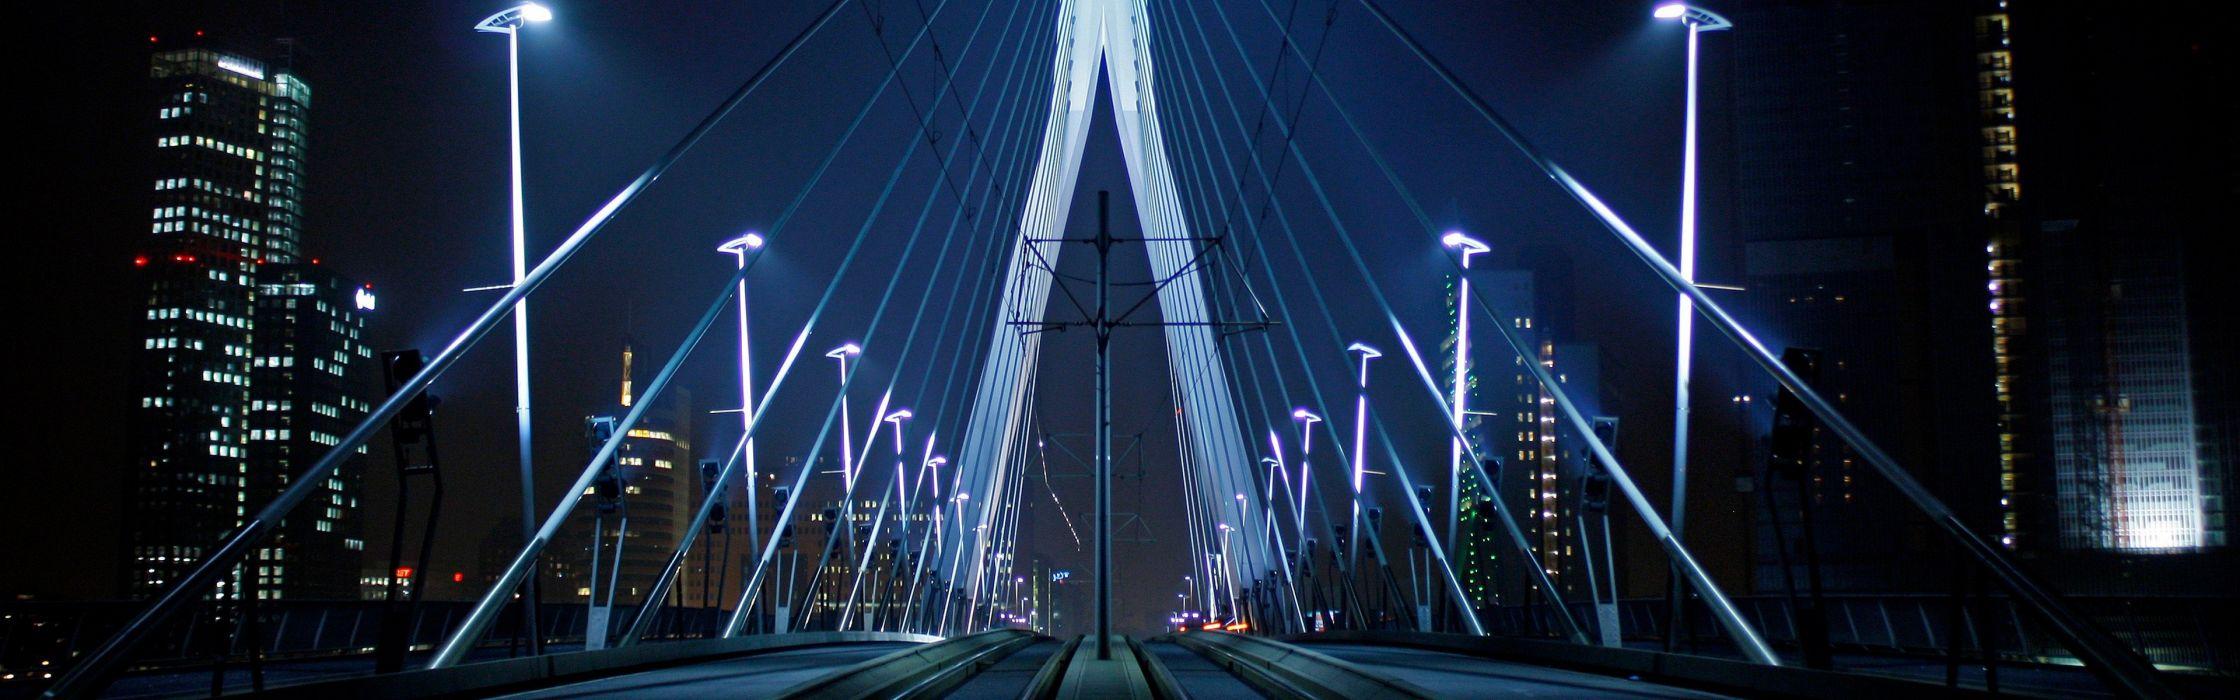 night lights bridges Holland Rotterdam The Netherlands Erasmusbrug wallpaper